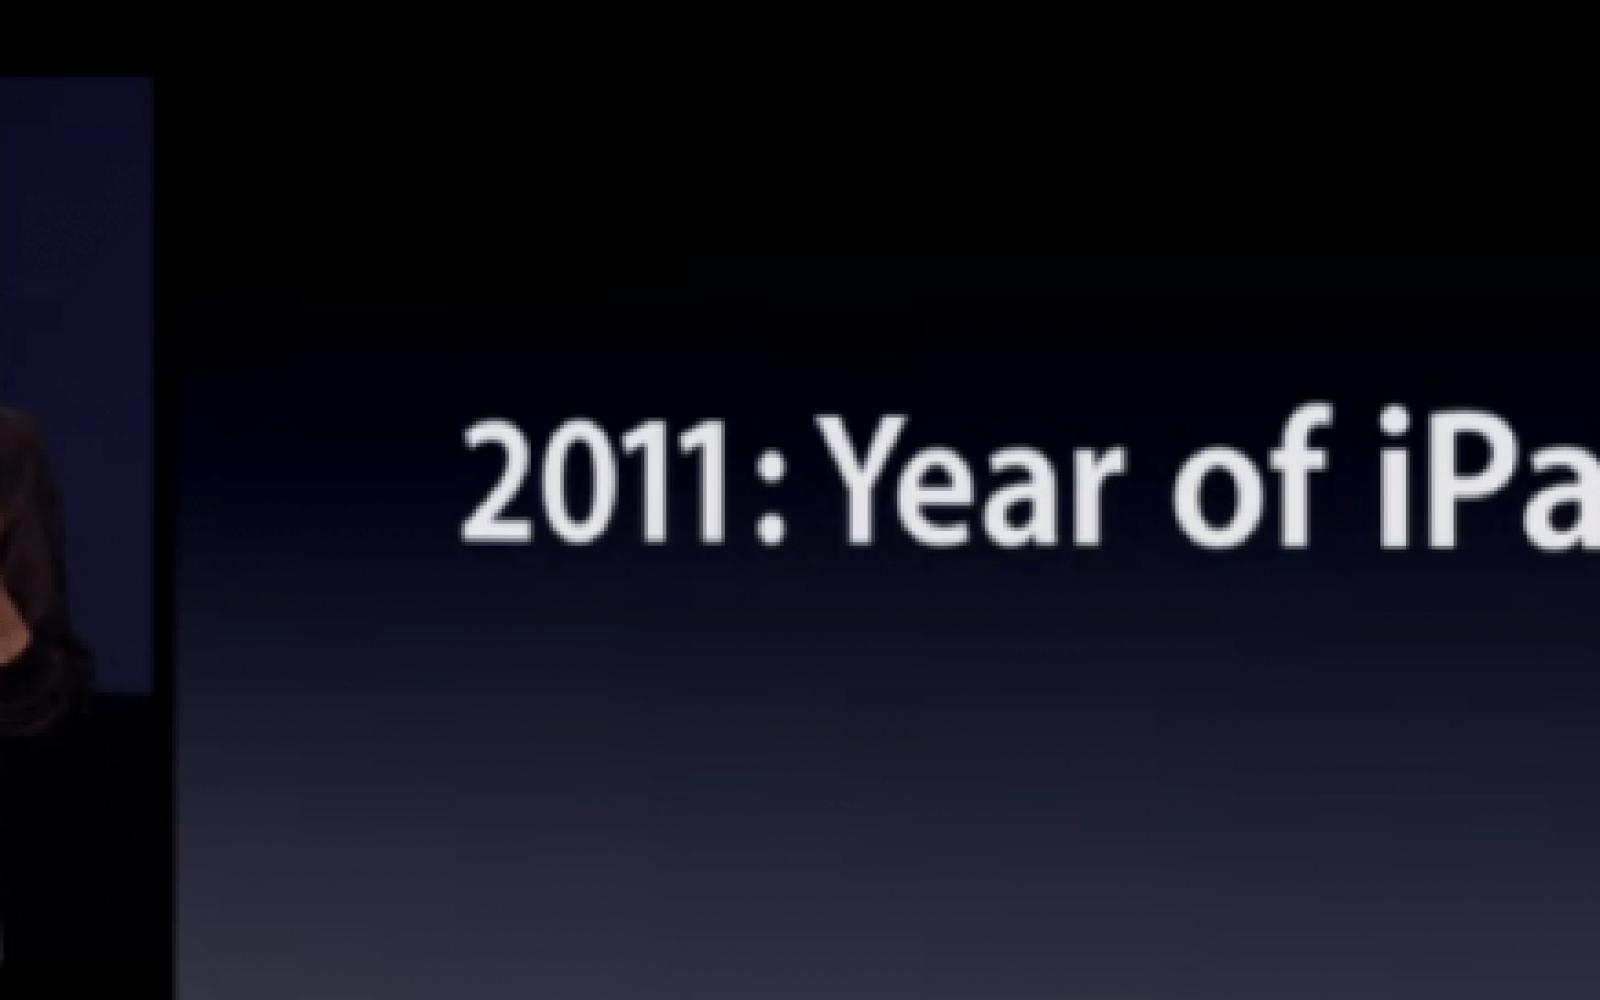 """iPad3,1"" and ""iPad3,2."" make an appearance in iOS 5"